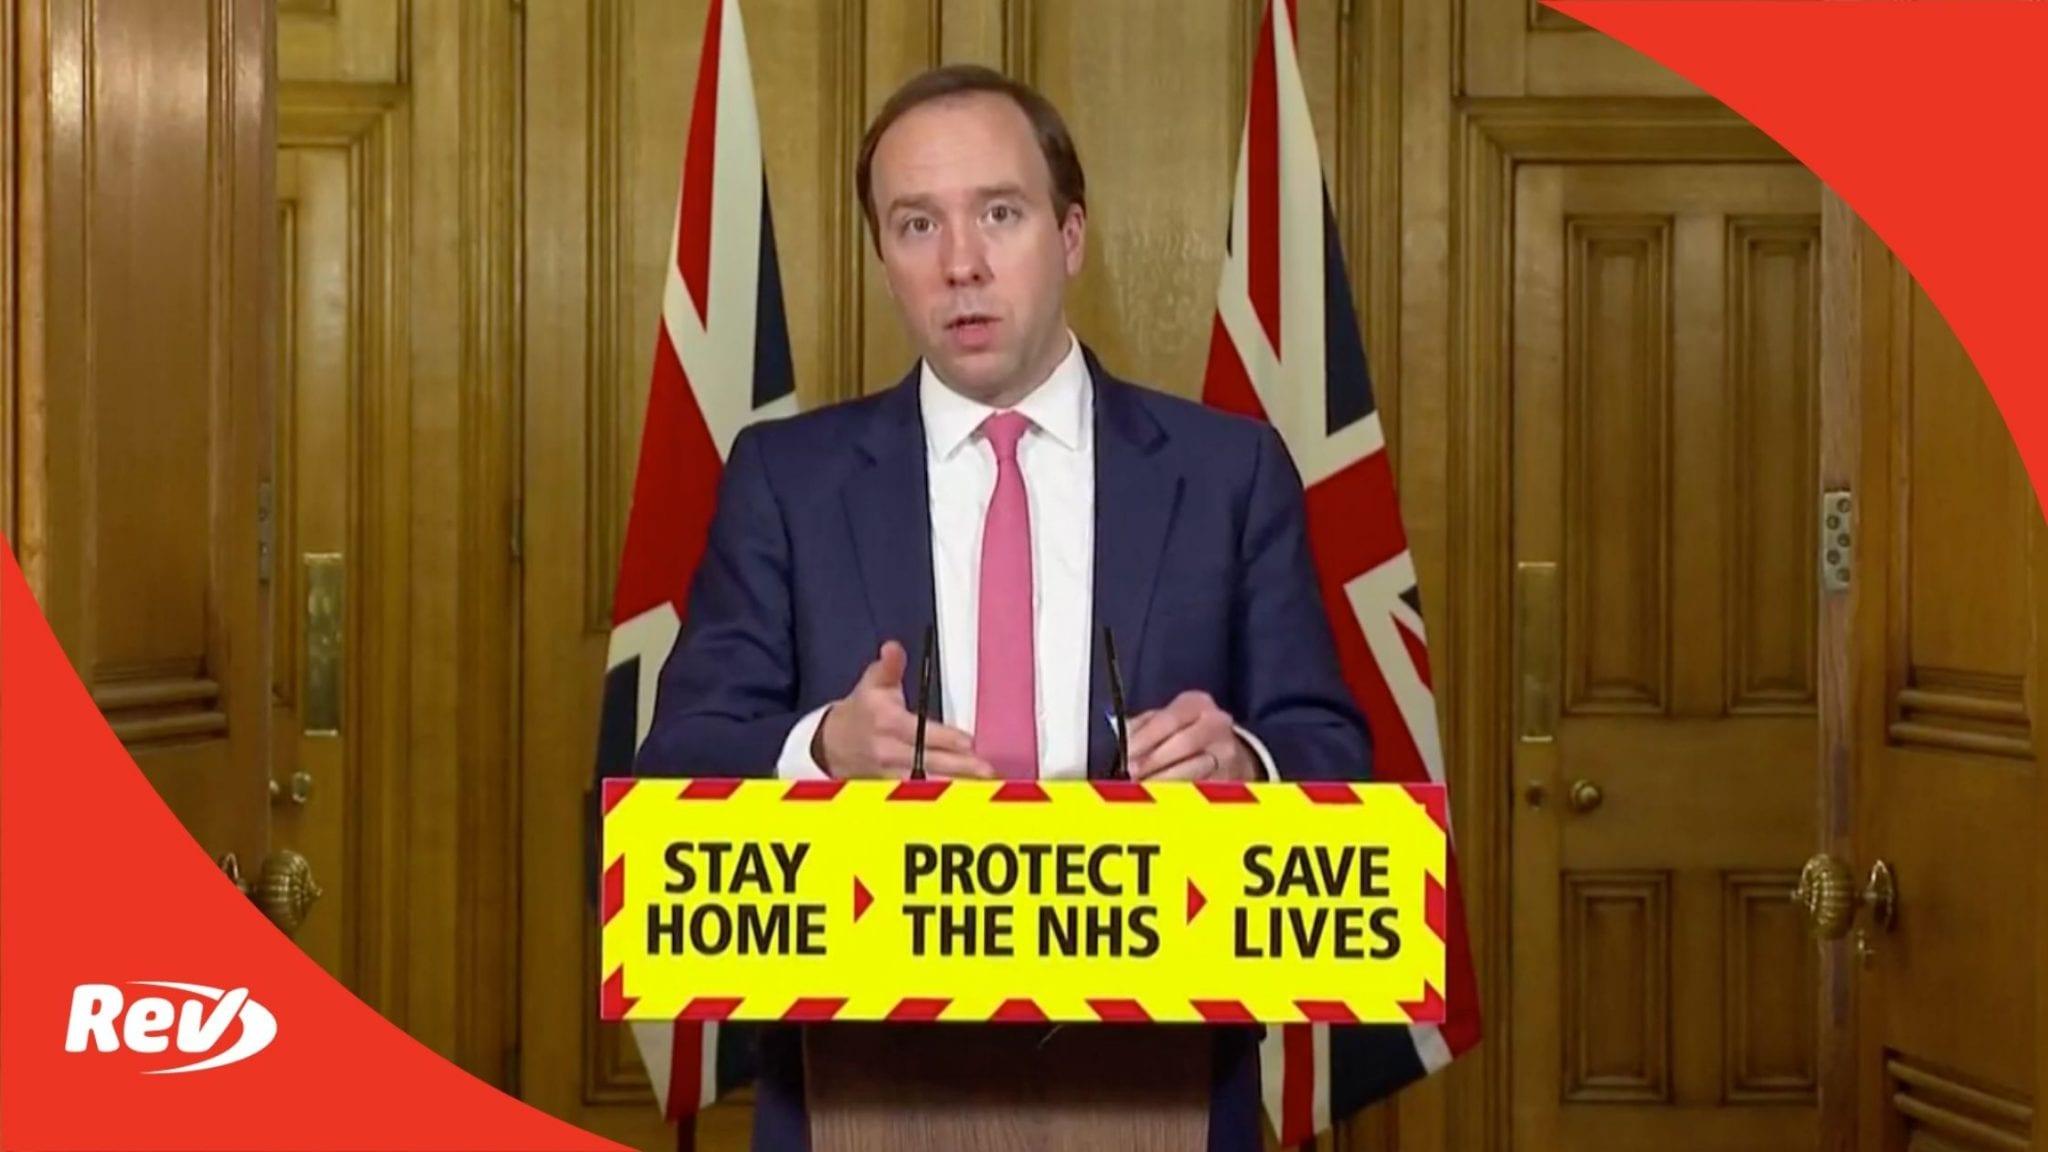 UK Downing Street Coronavirus Press Conference with Matt Hancock Transcript March 1